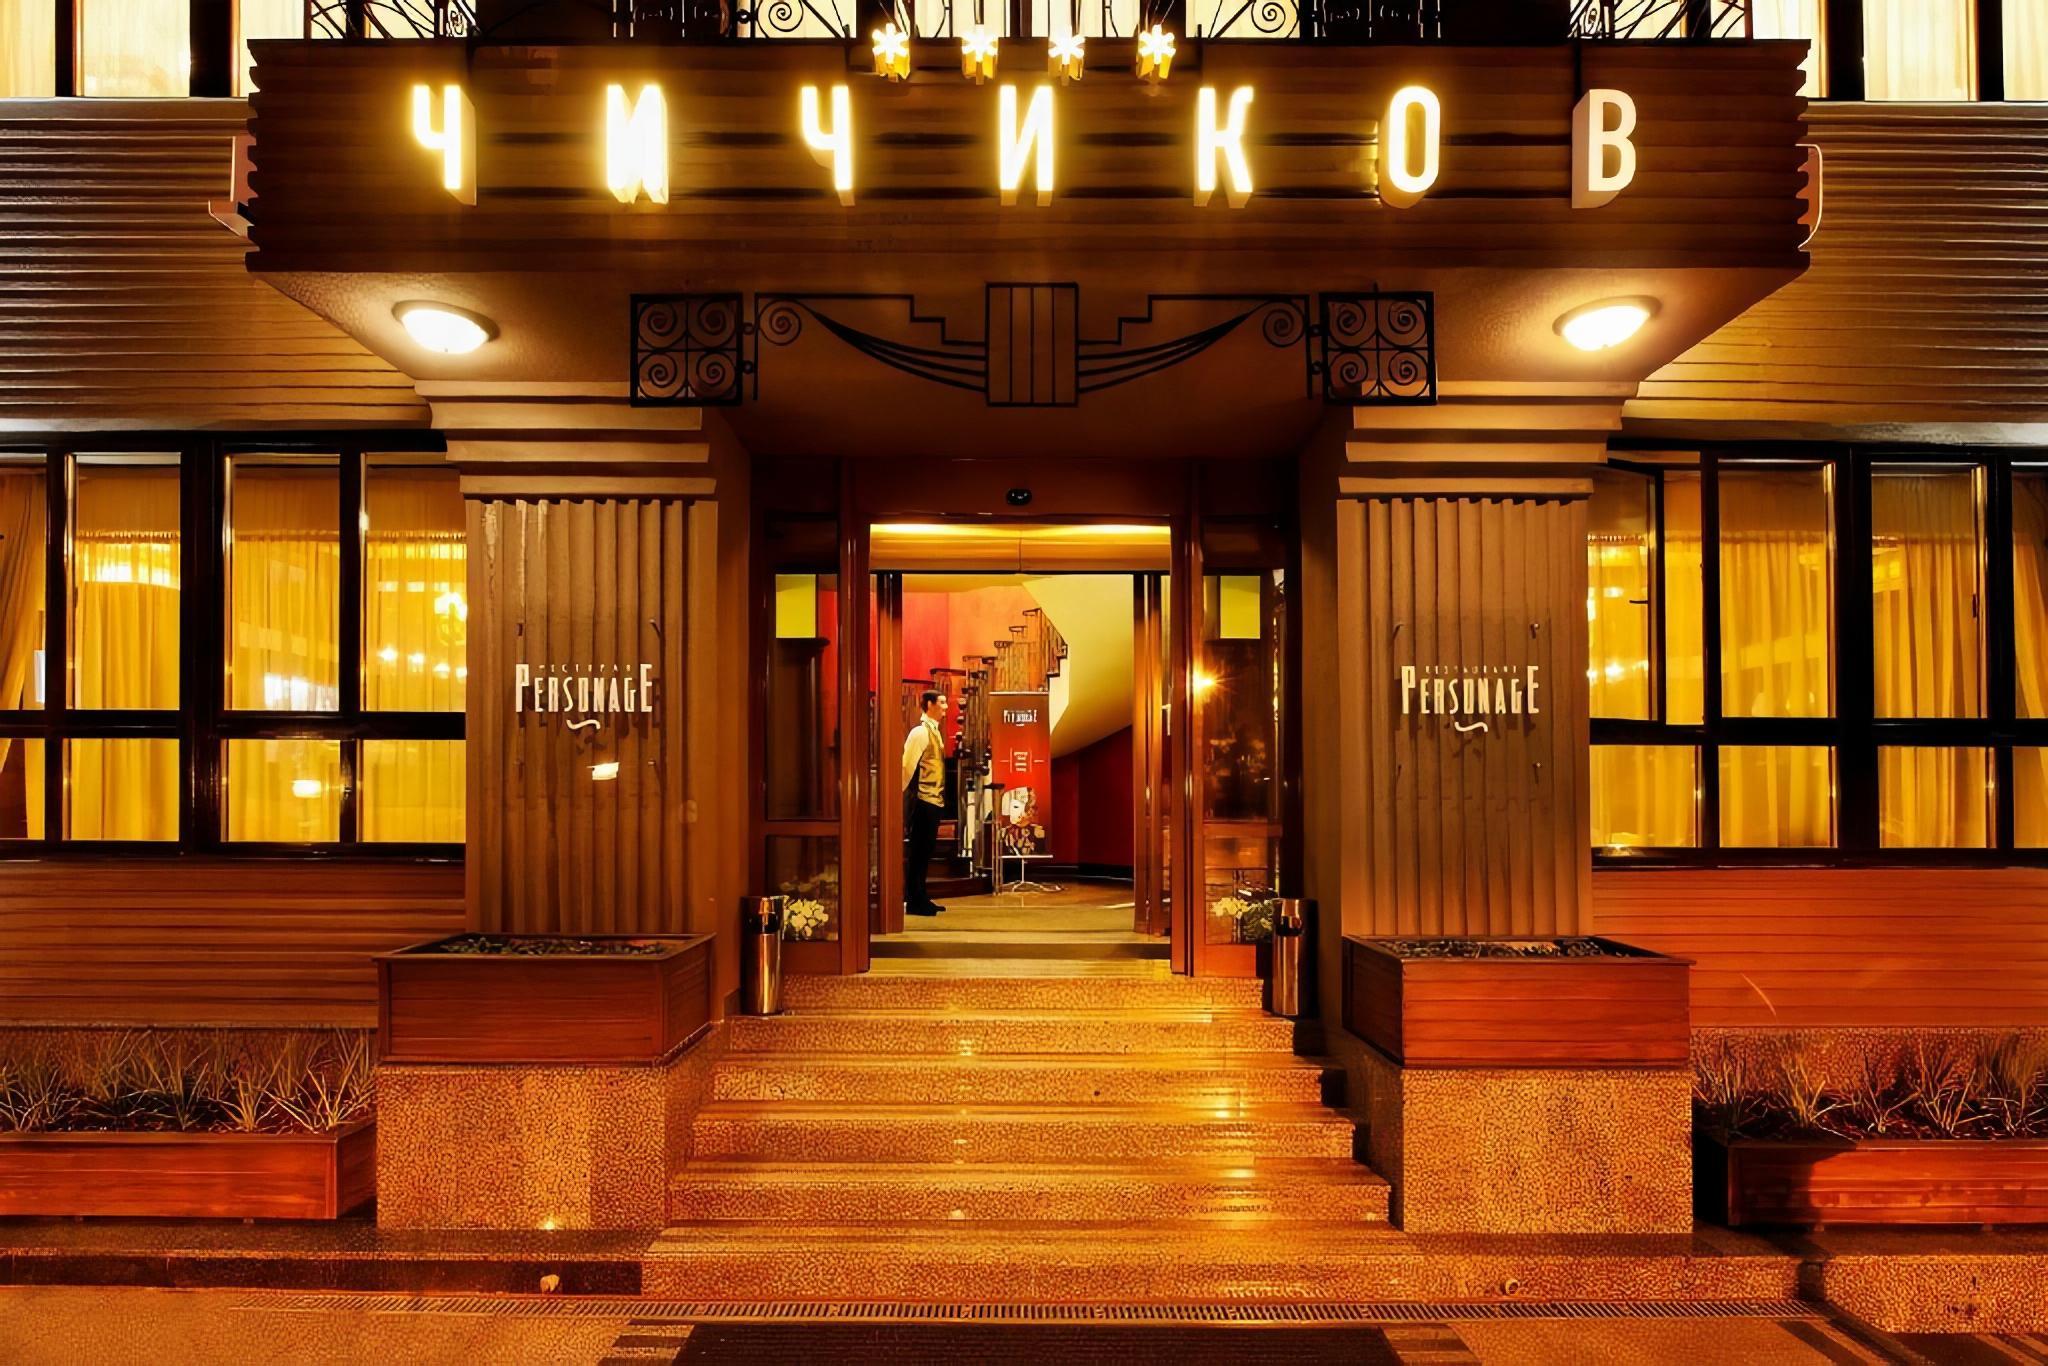 Chichikov Hotel in Kharkiv Ukraine